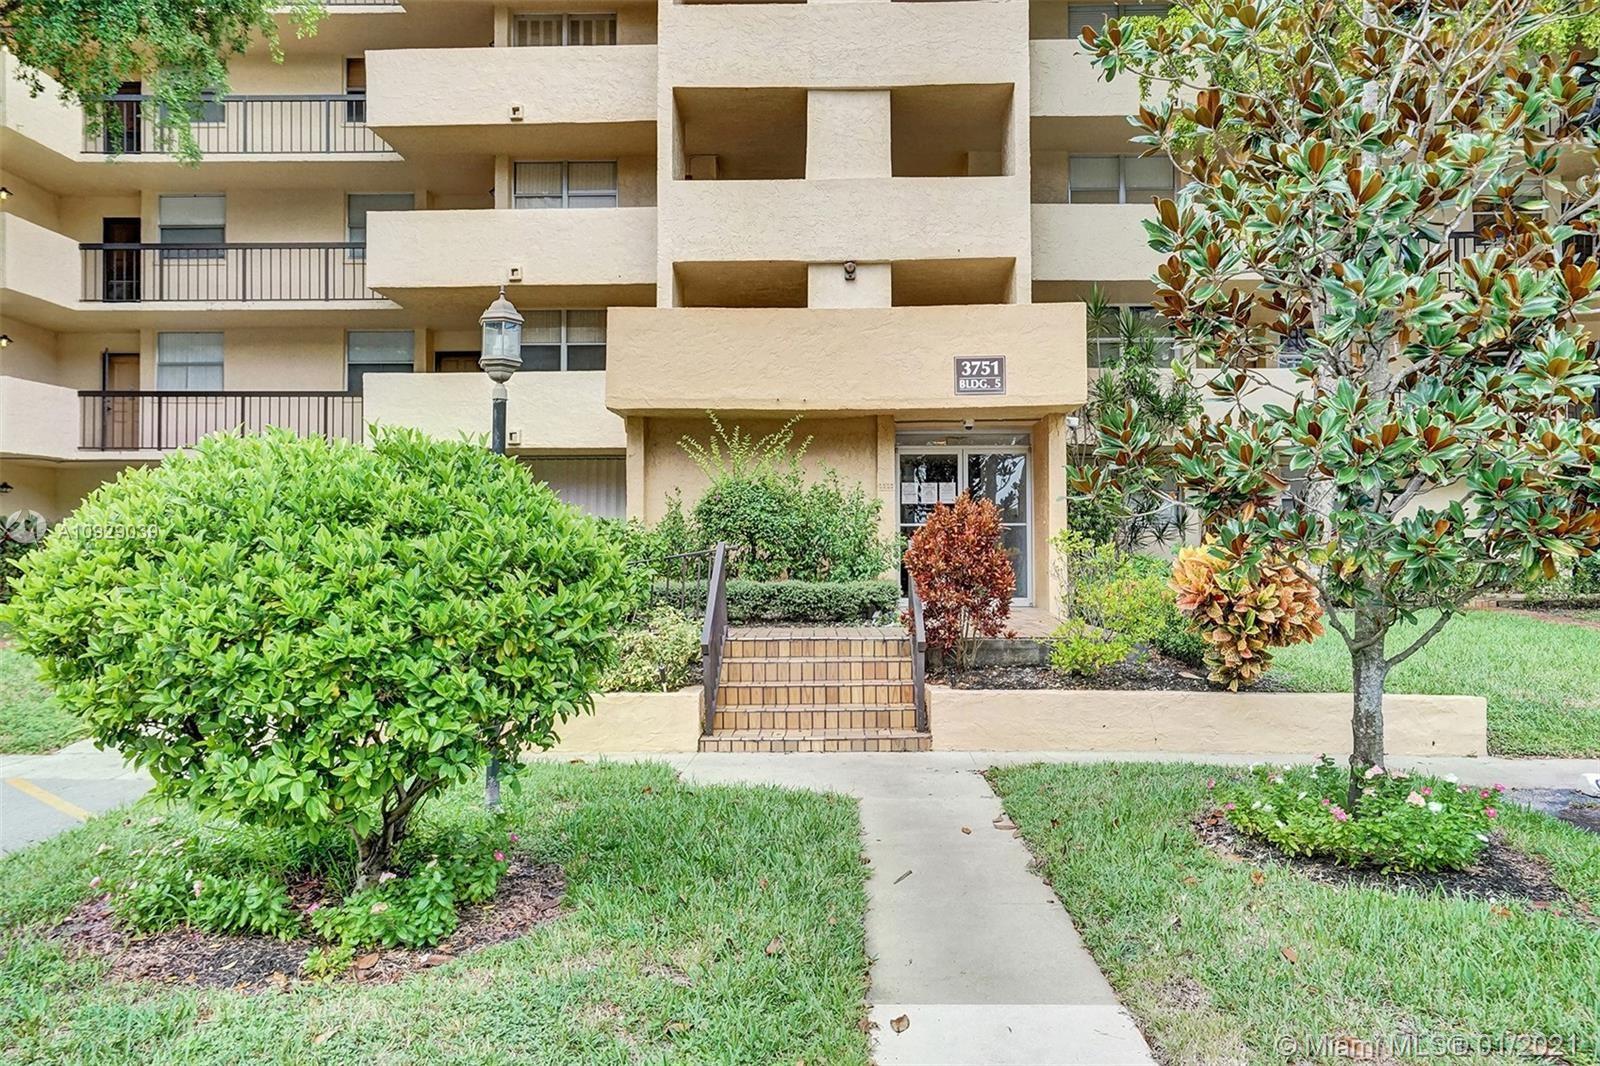 Photo of 3751 Environ Blvd #442, Lauderhill, FL 33319 (MLS # A10929039)